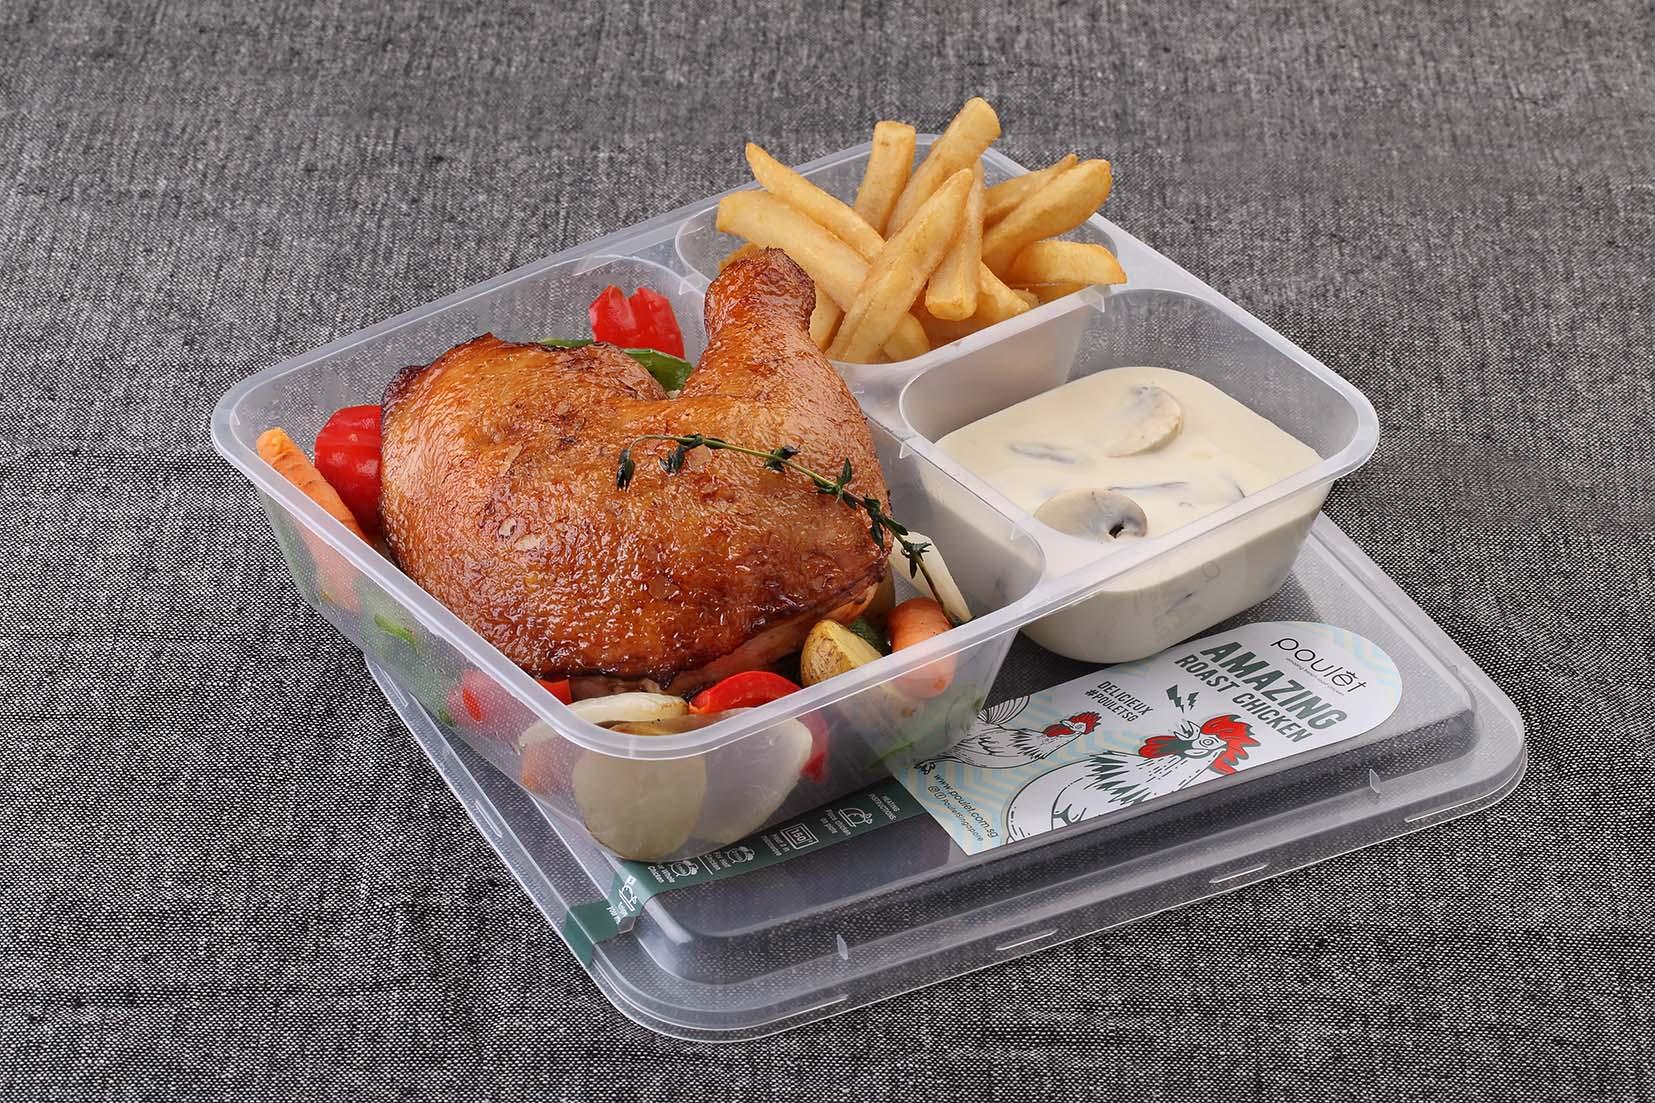 Poulet - Delivery Quarter Roast Chicken